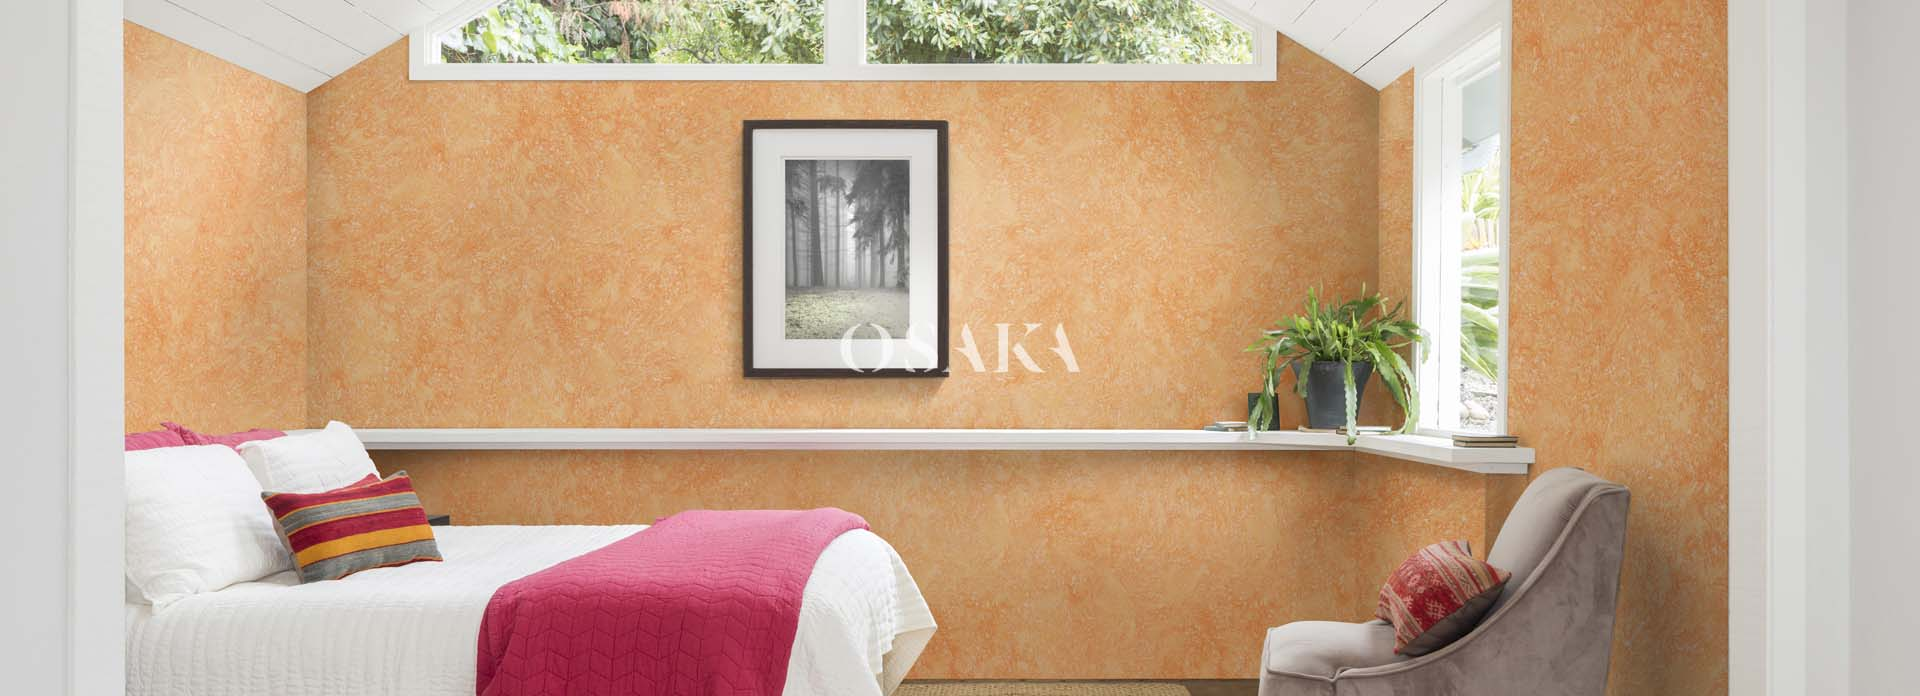 pintura-decorativa-Coral